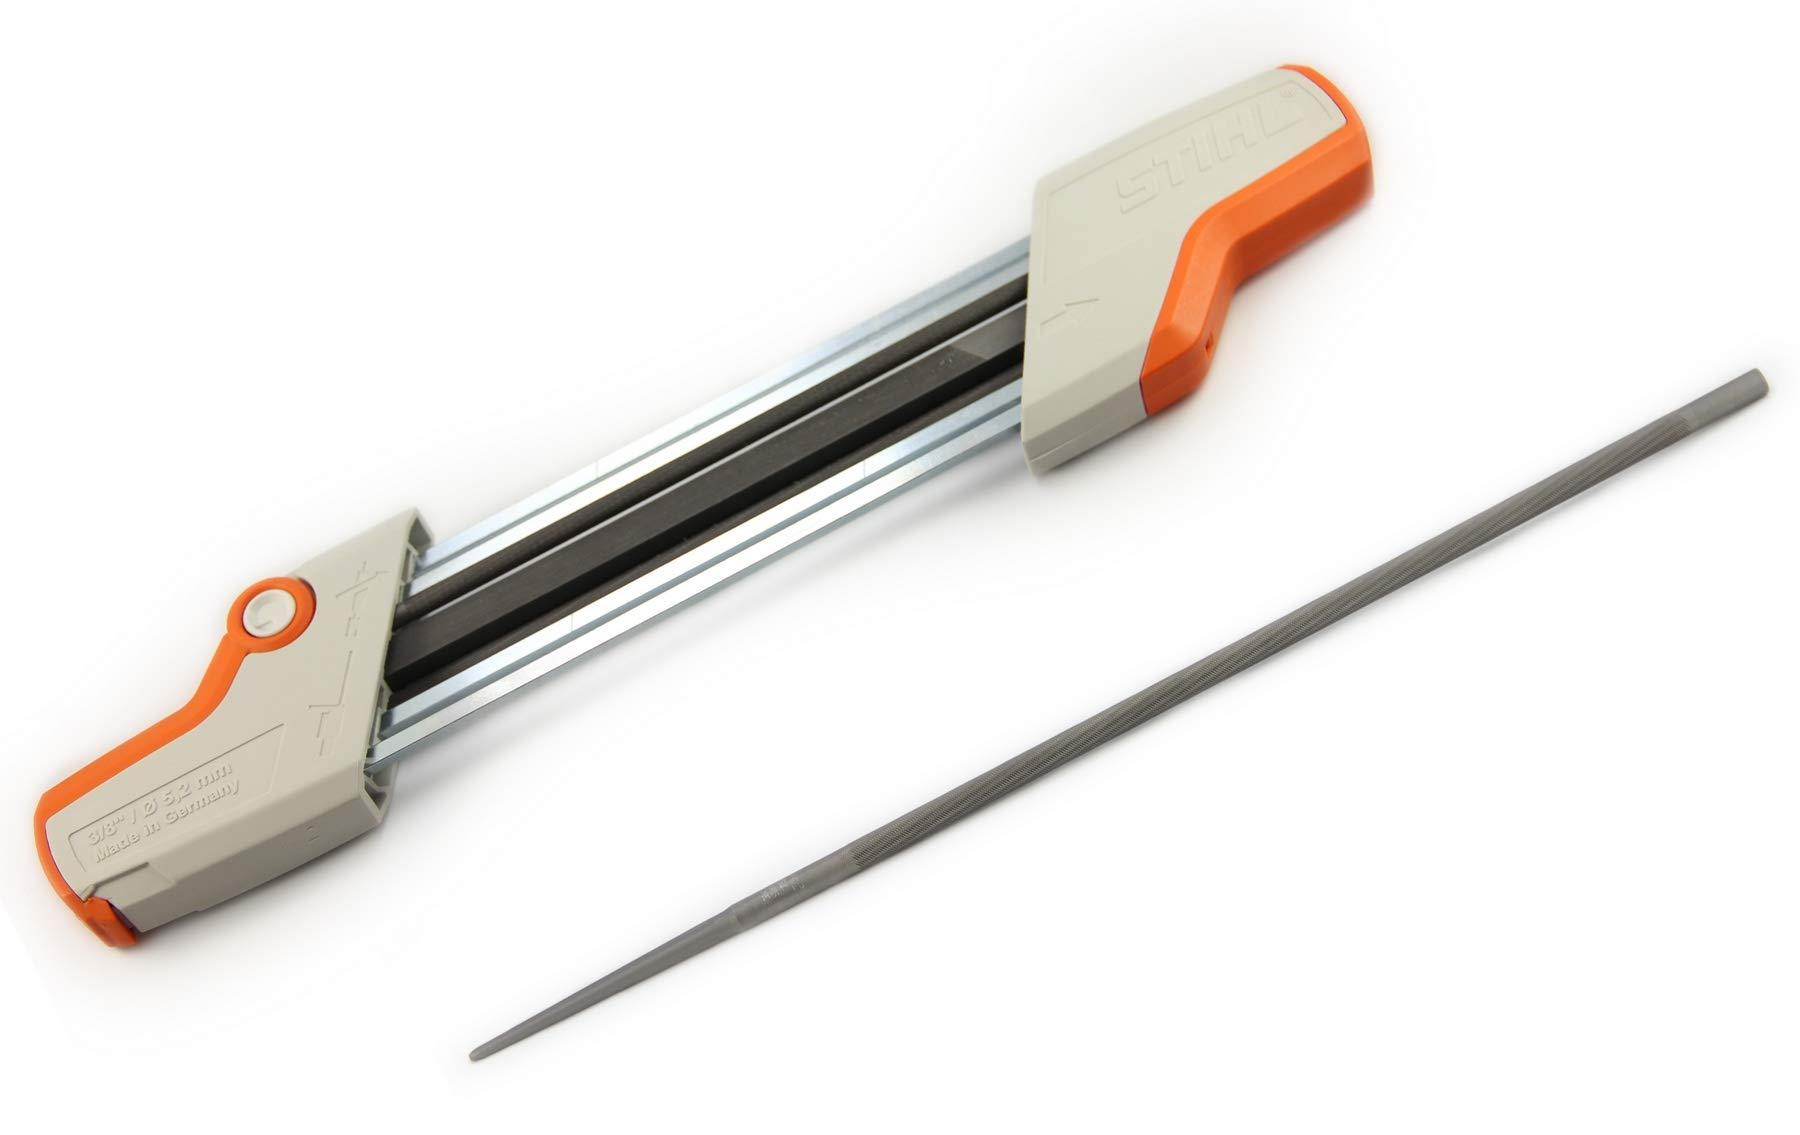 Stihl 2 in 1 Easy File Chainsaw Chain Sharpener 3/8 + bonus Replacement File! by Stihl